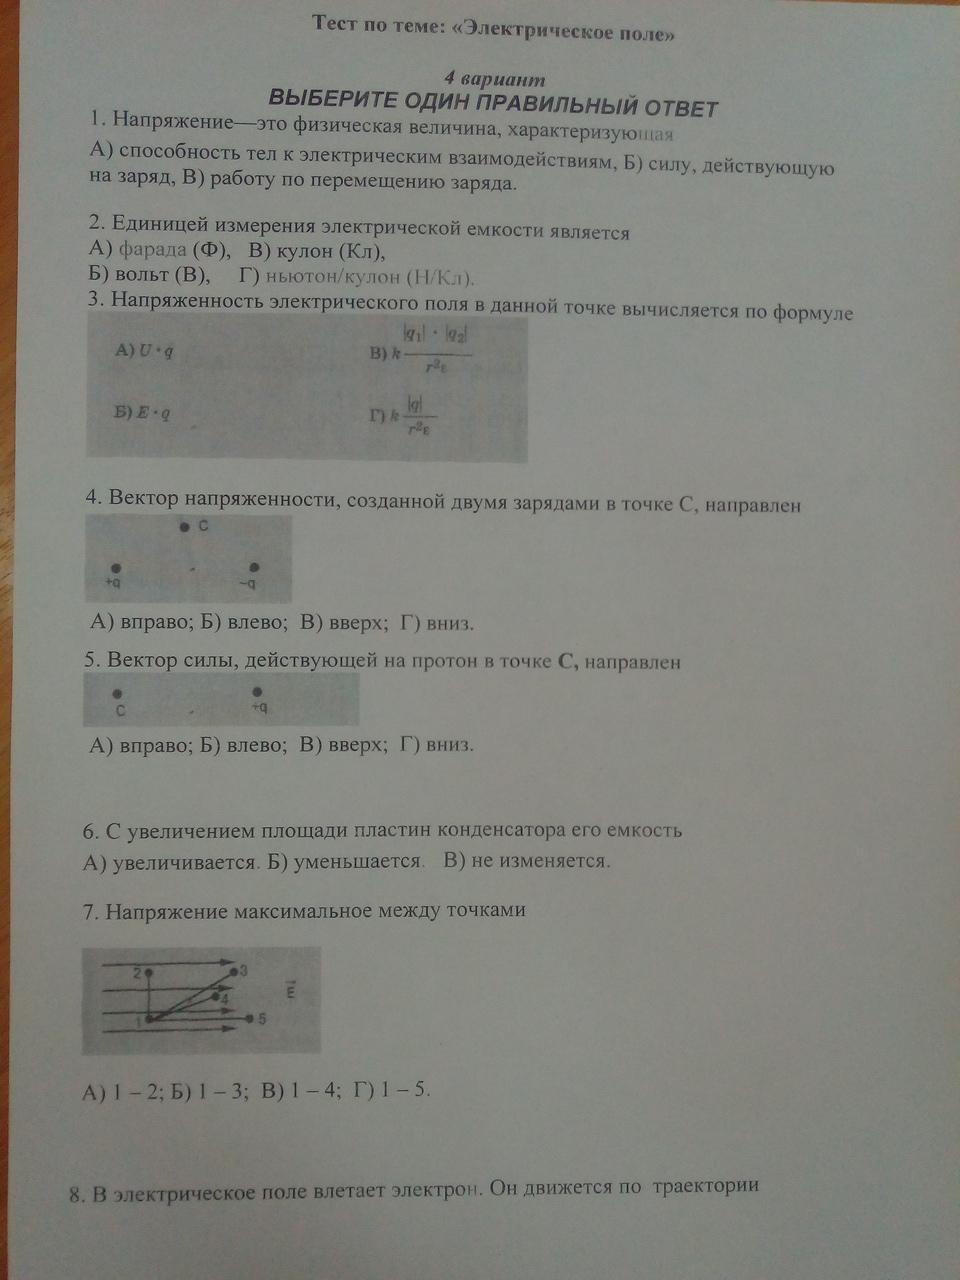 C:\Users\Никита Сергеевич\Desktop\Uur34JEHlRc.jpg